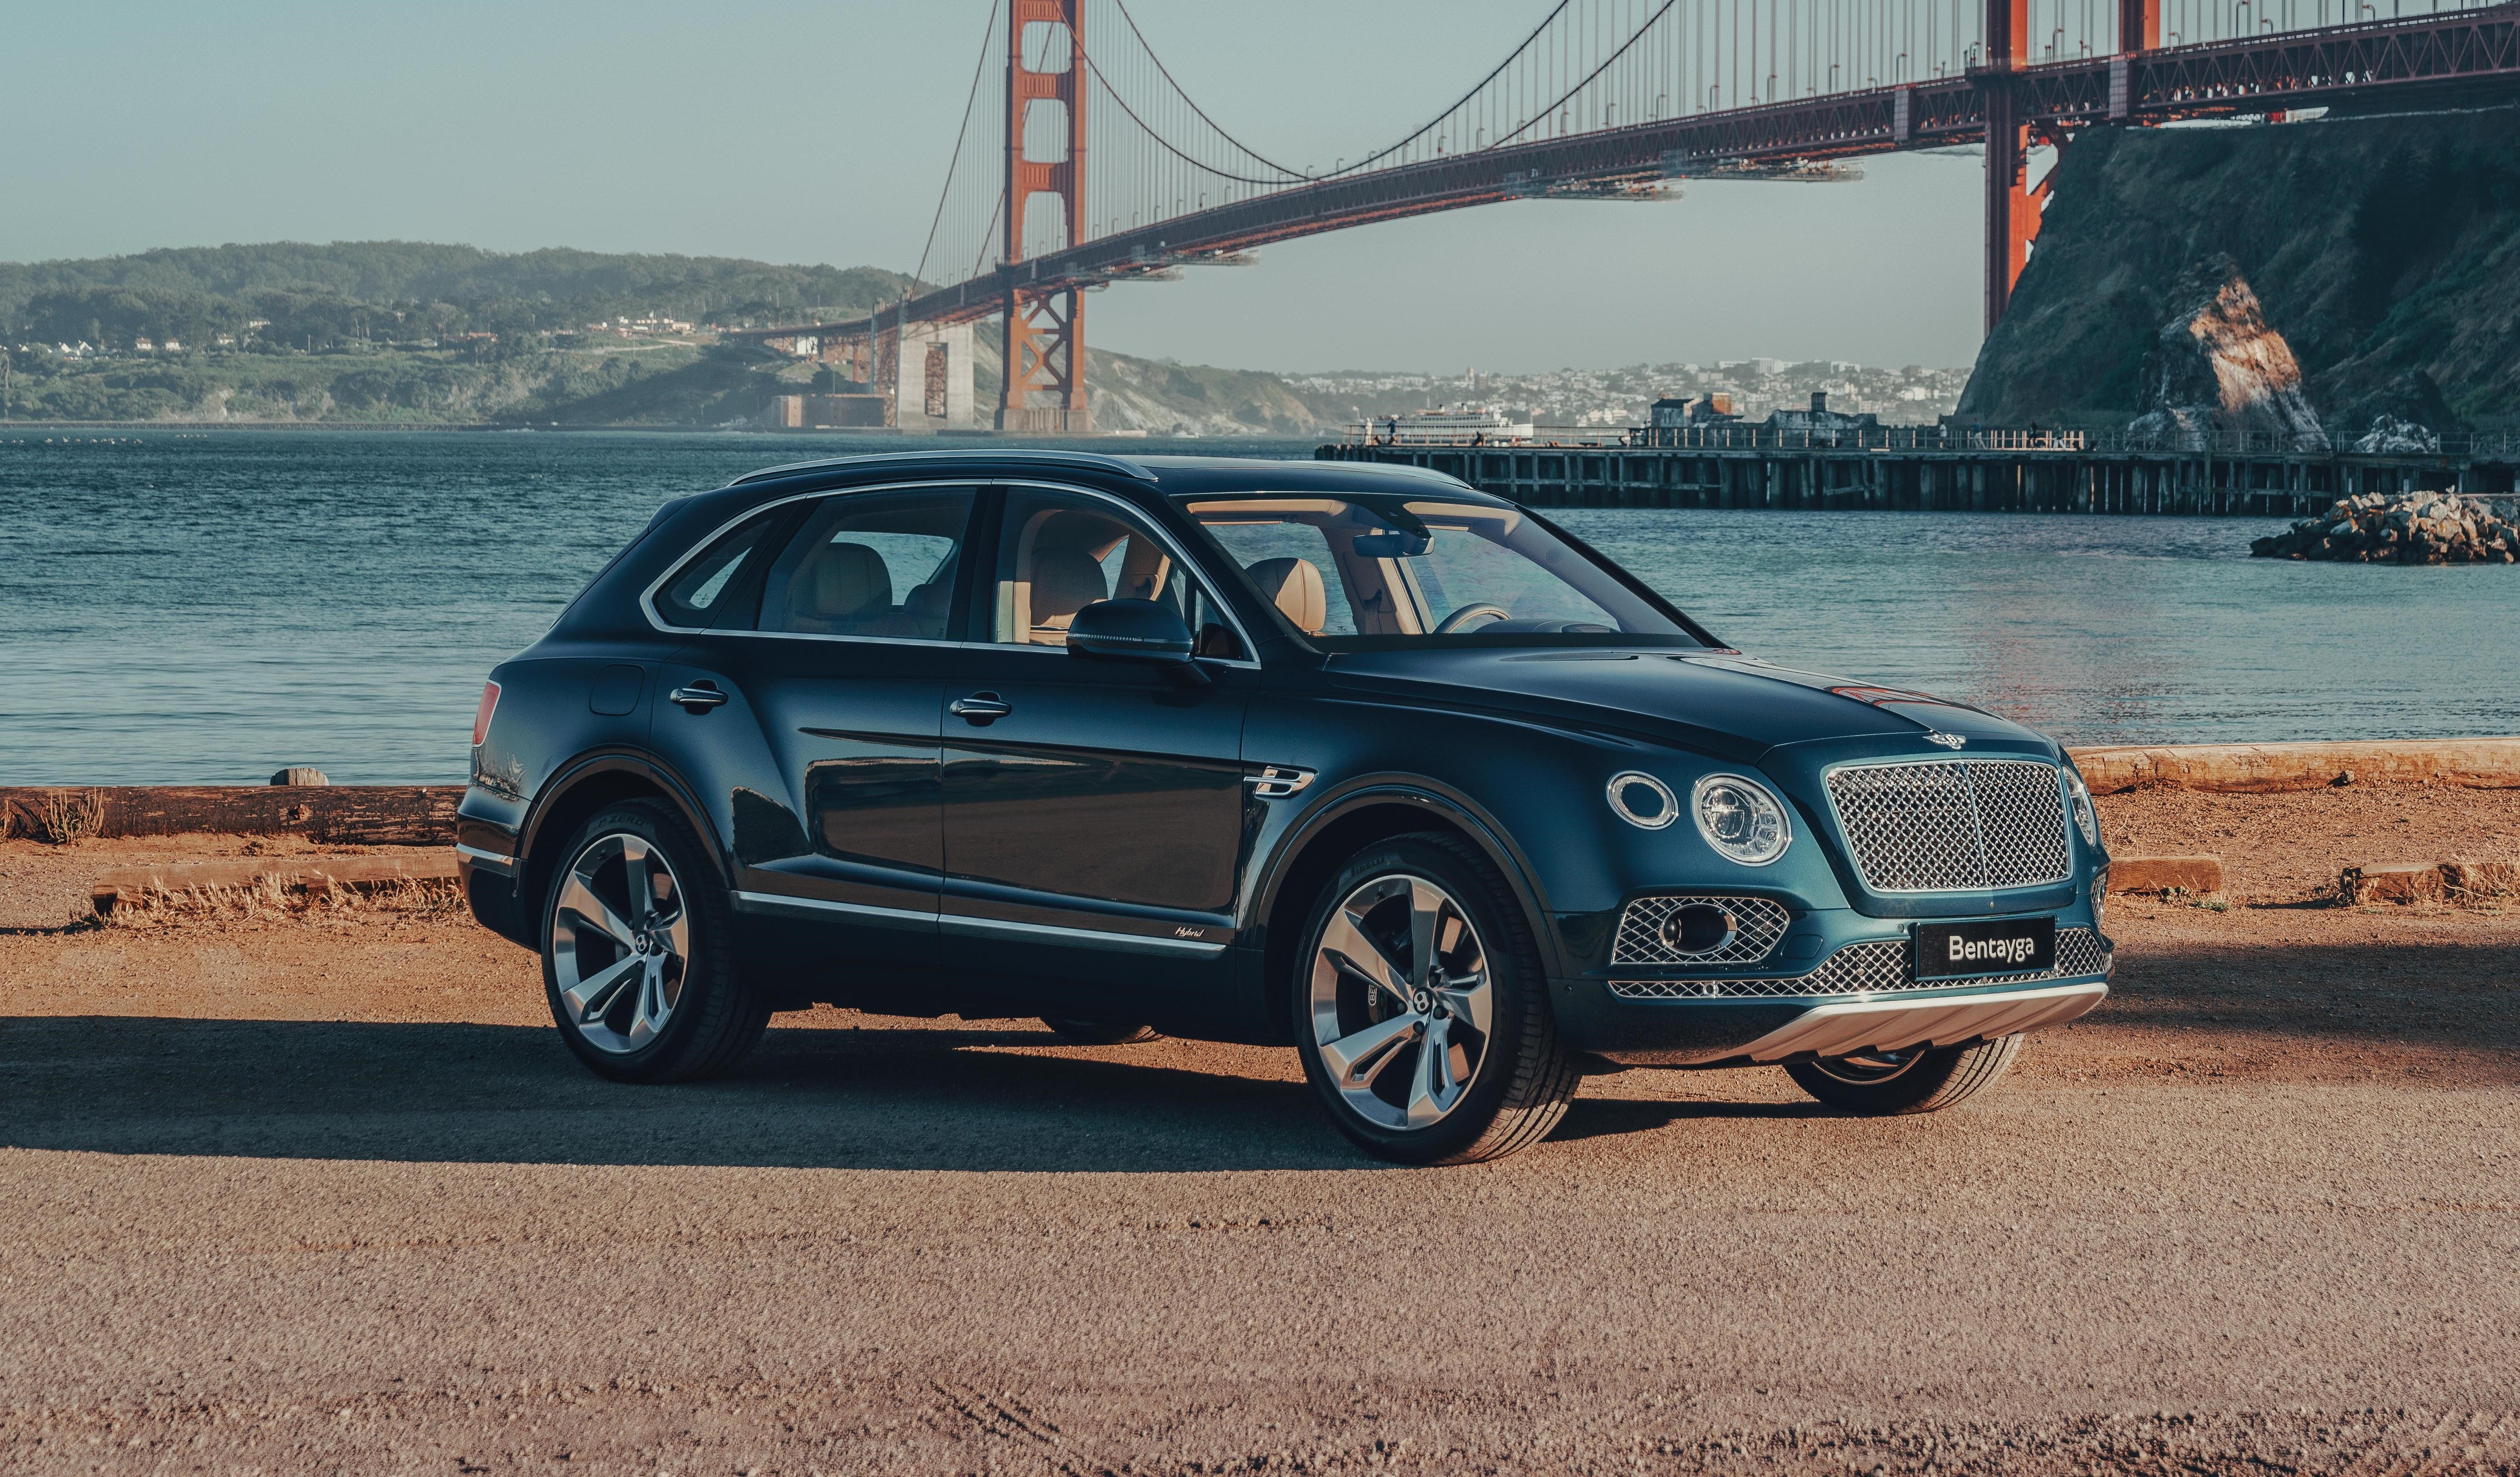 2020 Bentley Bentayga Hybrid Review